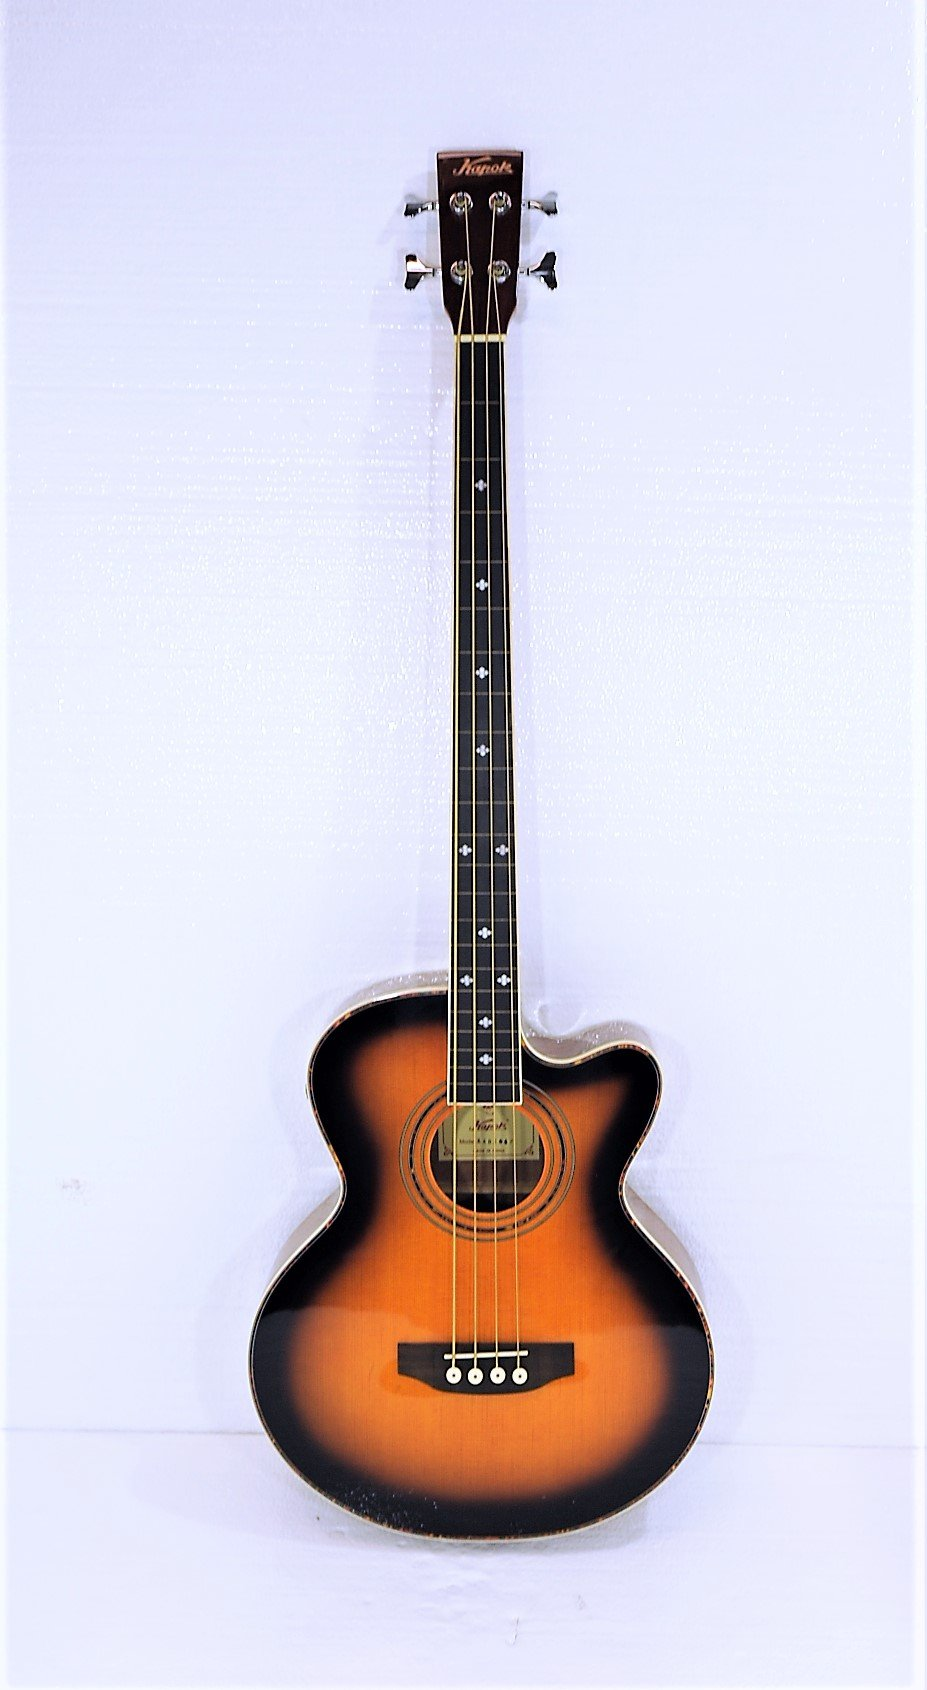 Fretless 4 String Cutaway Acoustic Electric Bass, Sunburst Top